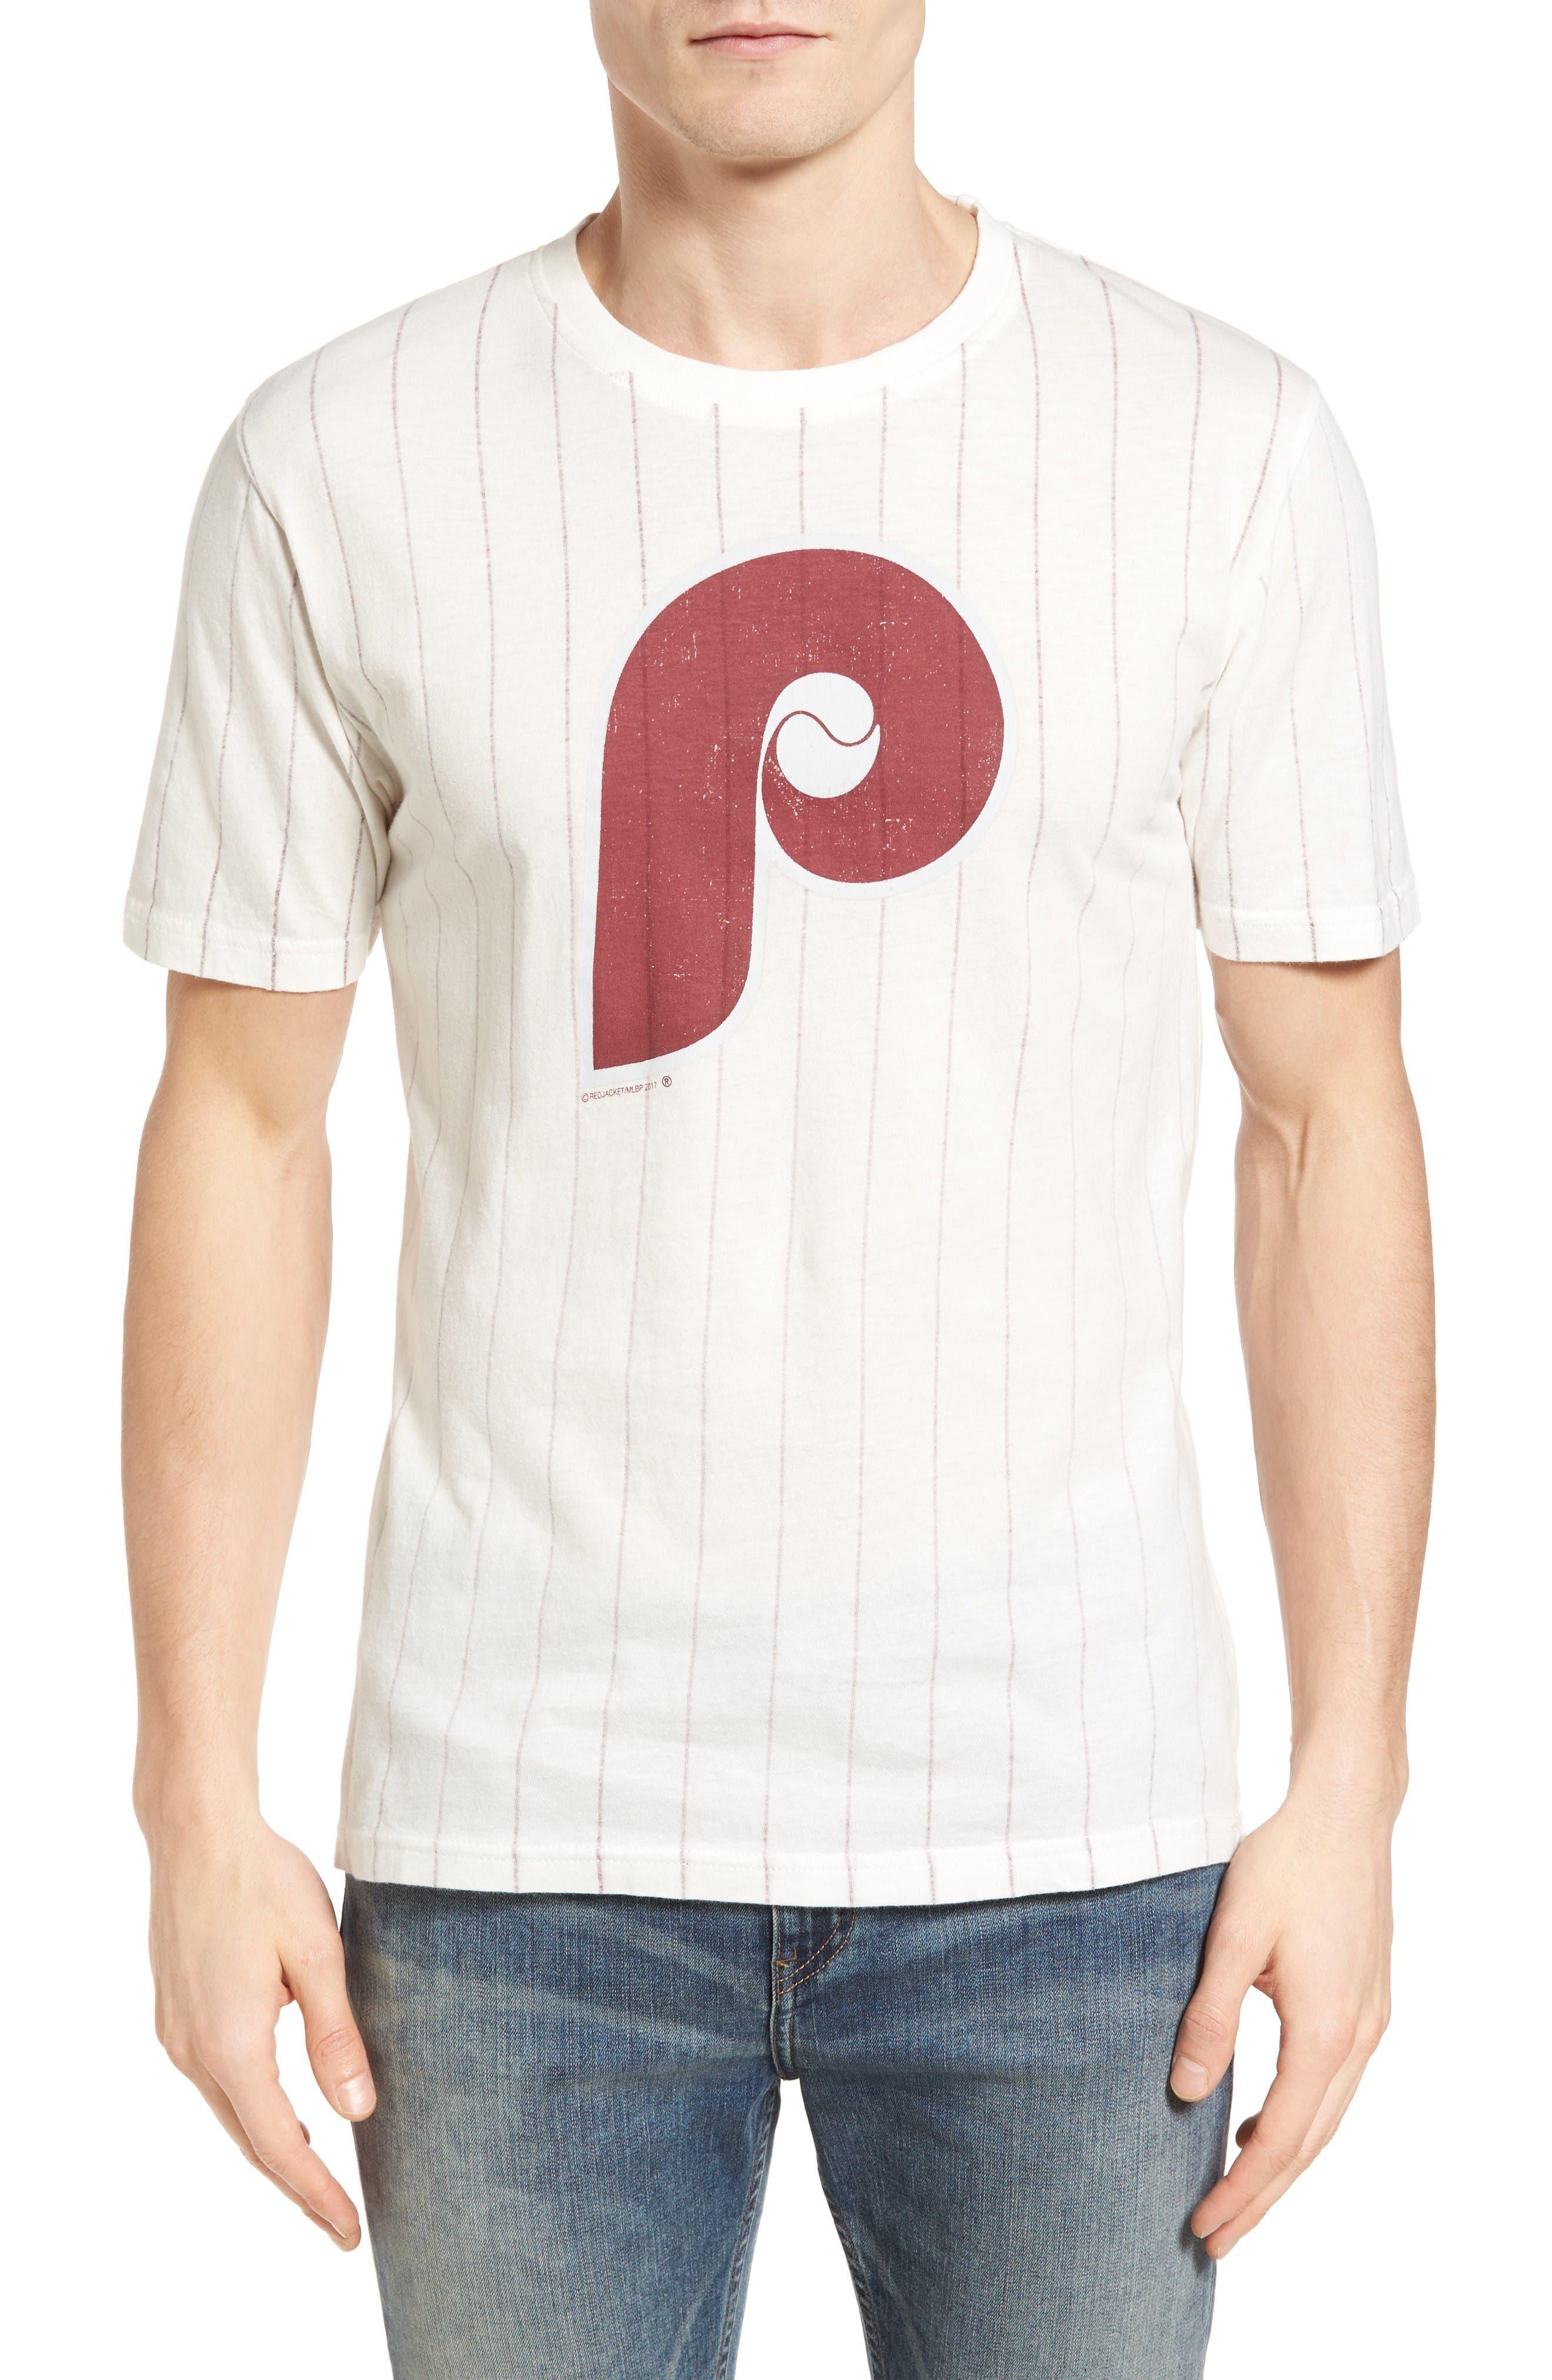 American Needle Brass Tack Philadelphia Phillies T-Shirt